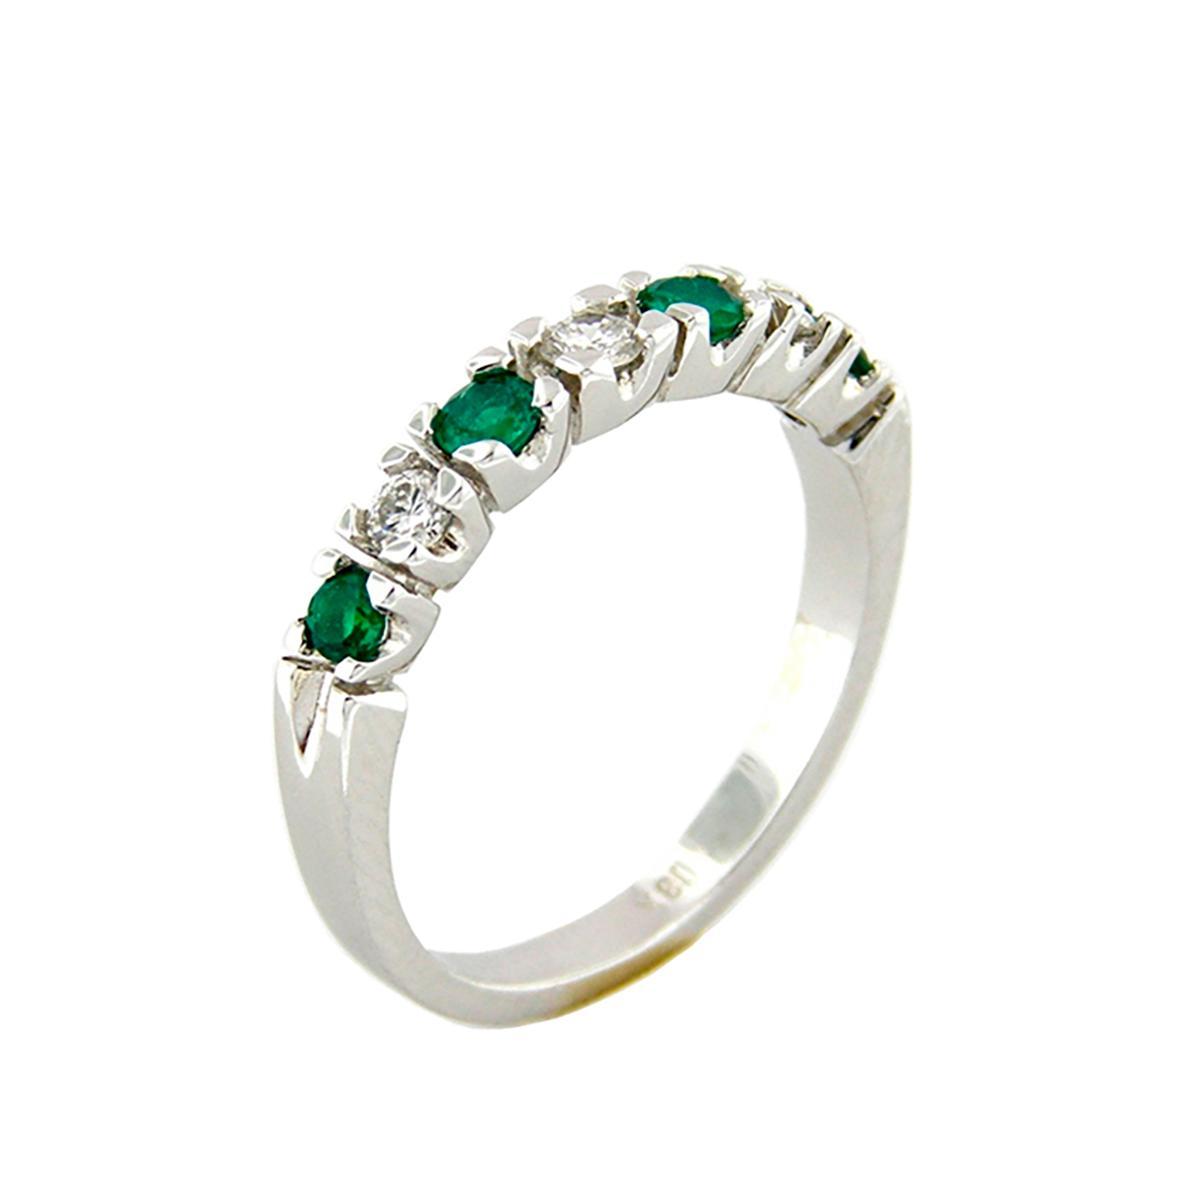 half-eternity-7-stone-emerald-and-diamond-wedding-band-ring-in-18k-white-gold